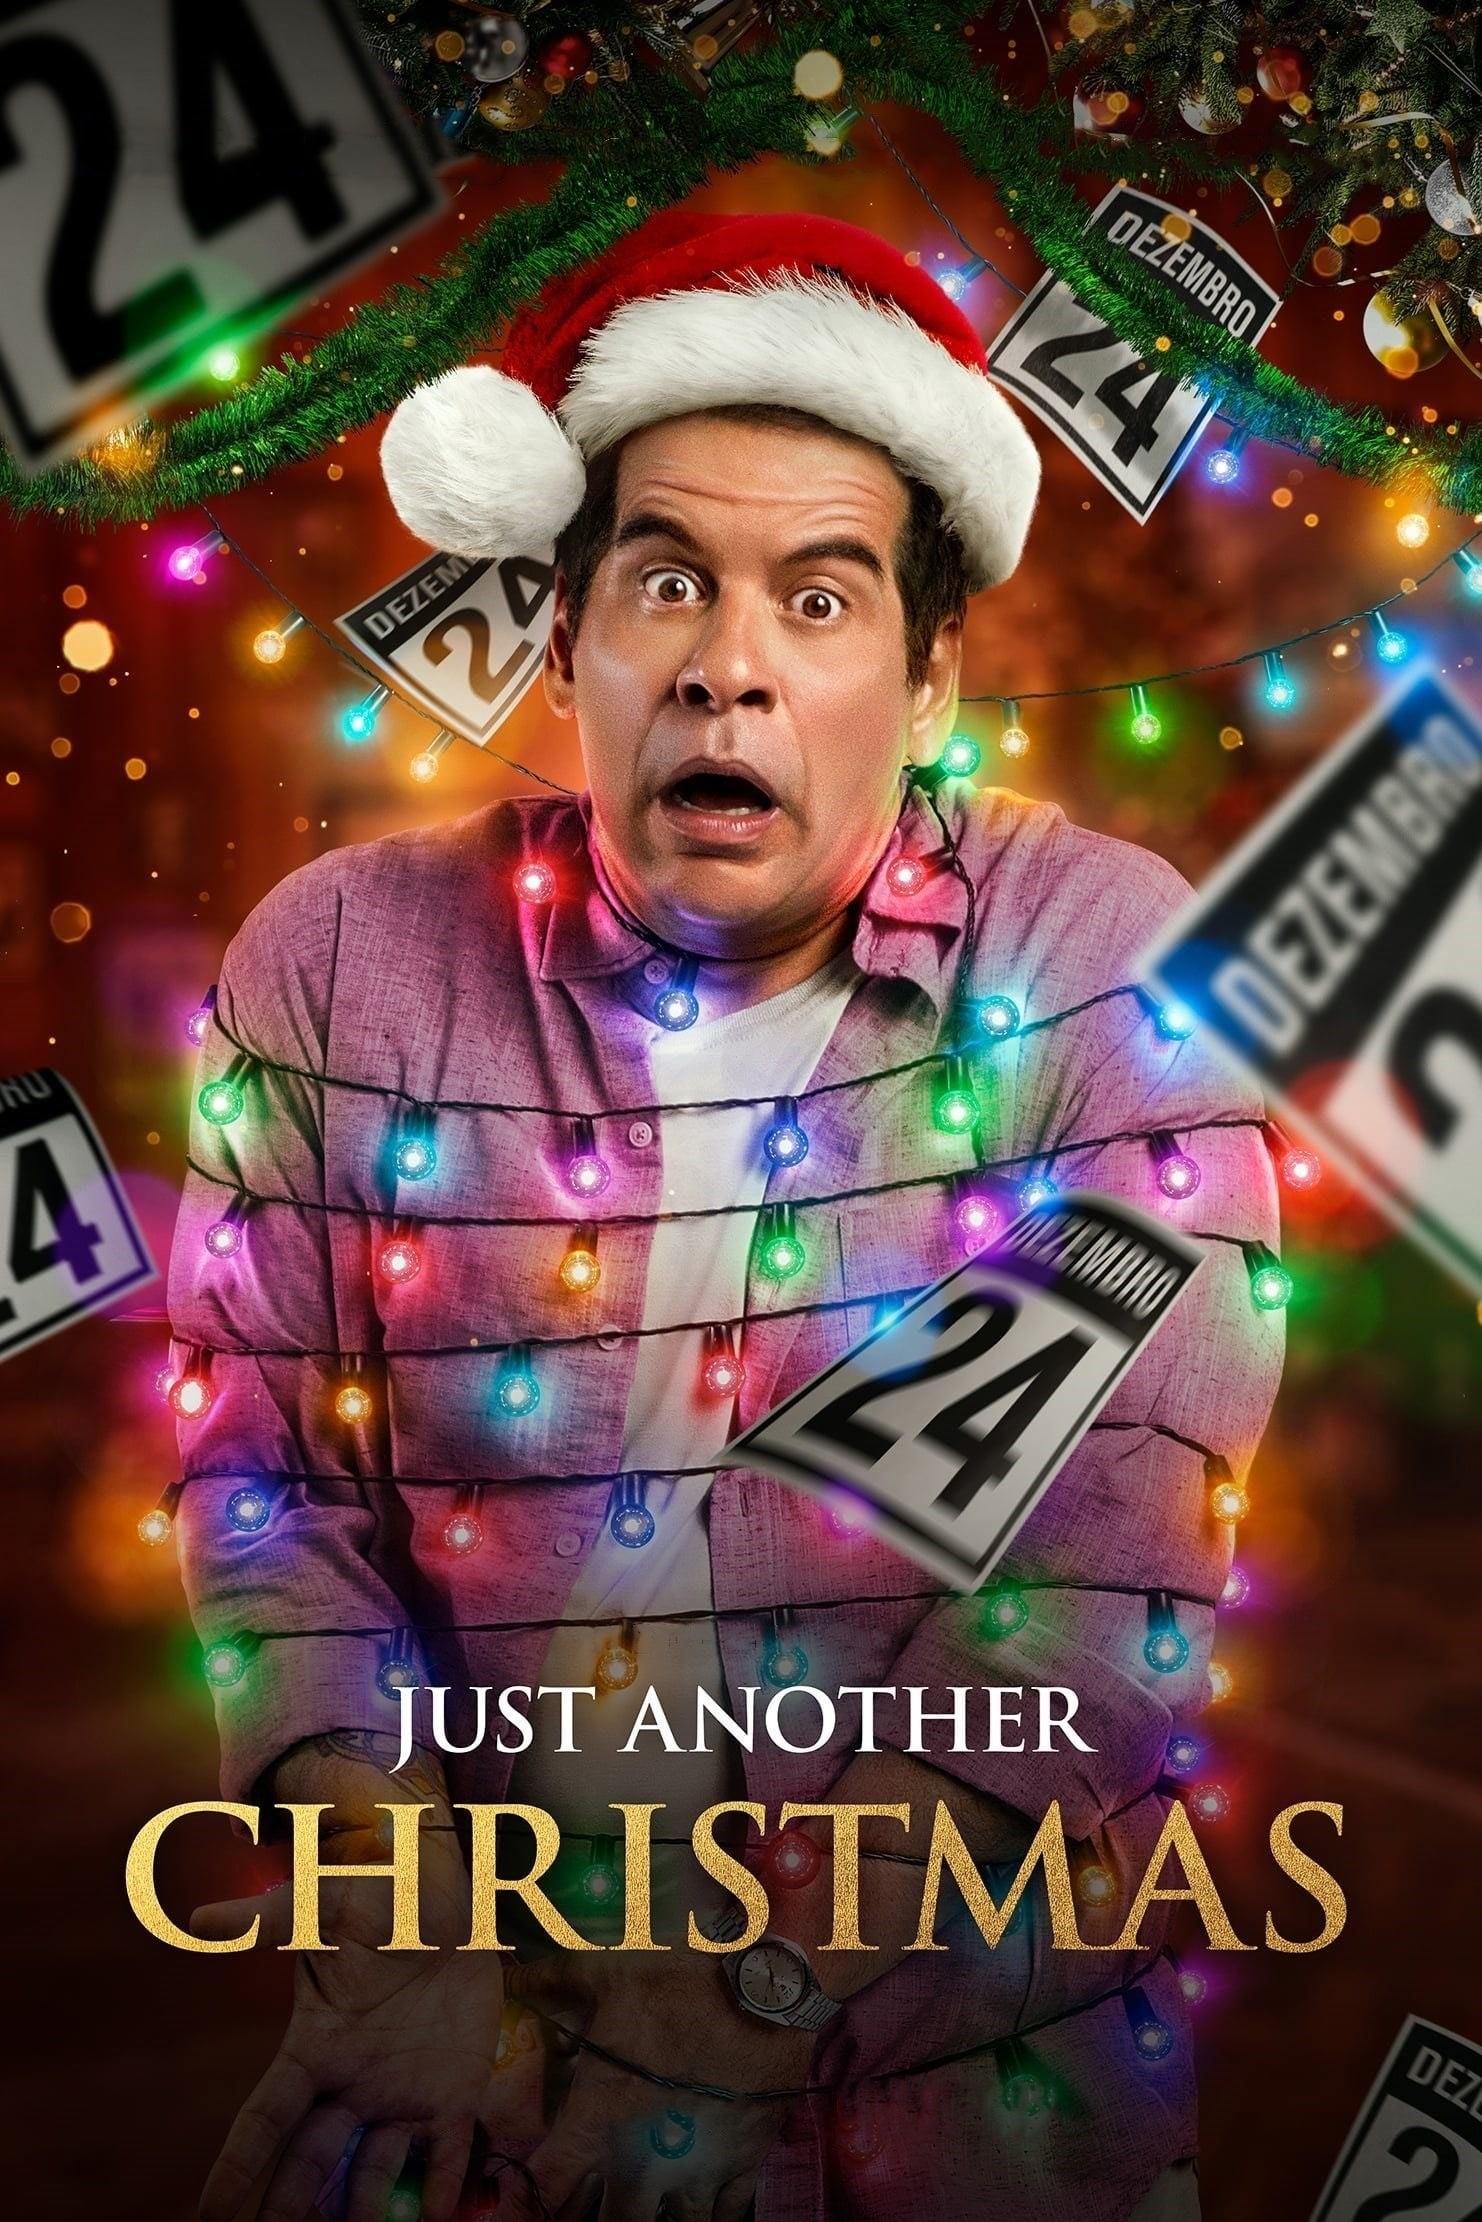 دانلود فیلم Just Another Christmas 2020